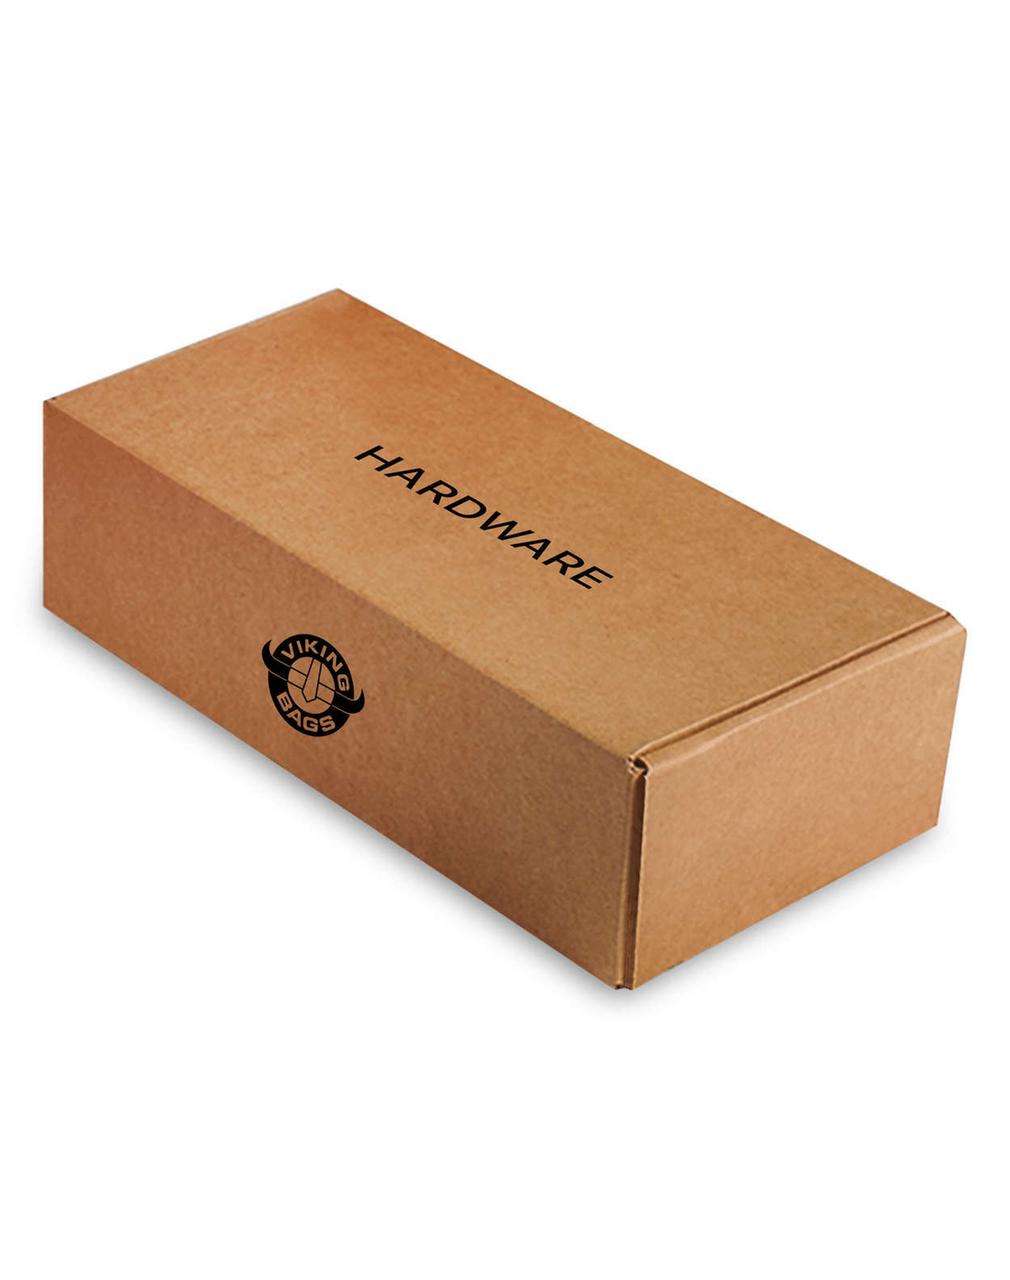 Honda 750 Shadow Aero Hammer Series Extra Large Plain Motorcycle Saddlebags Box